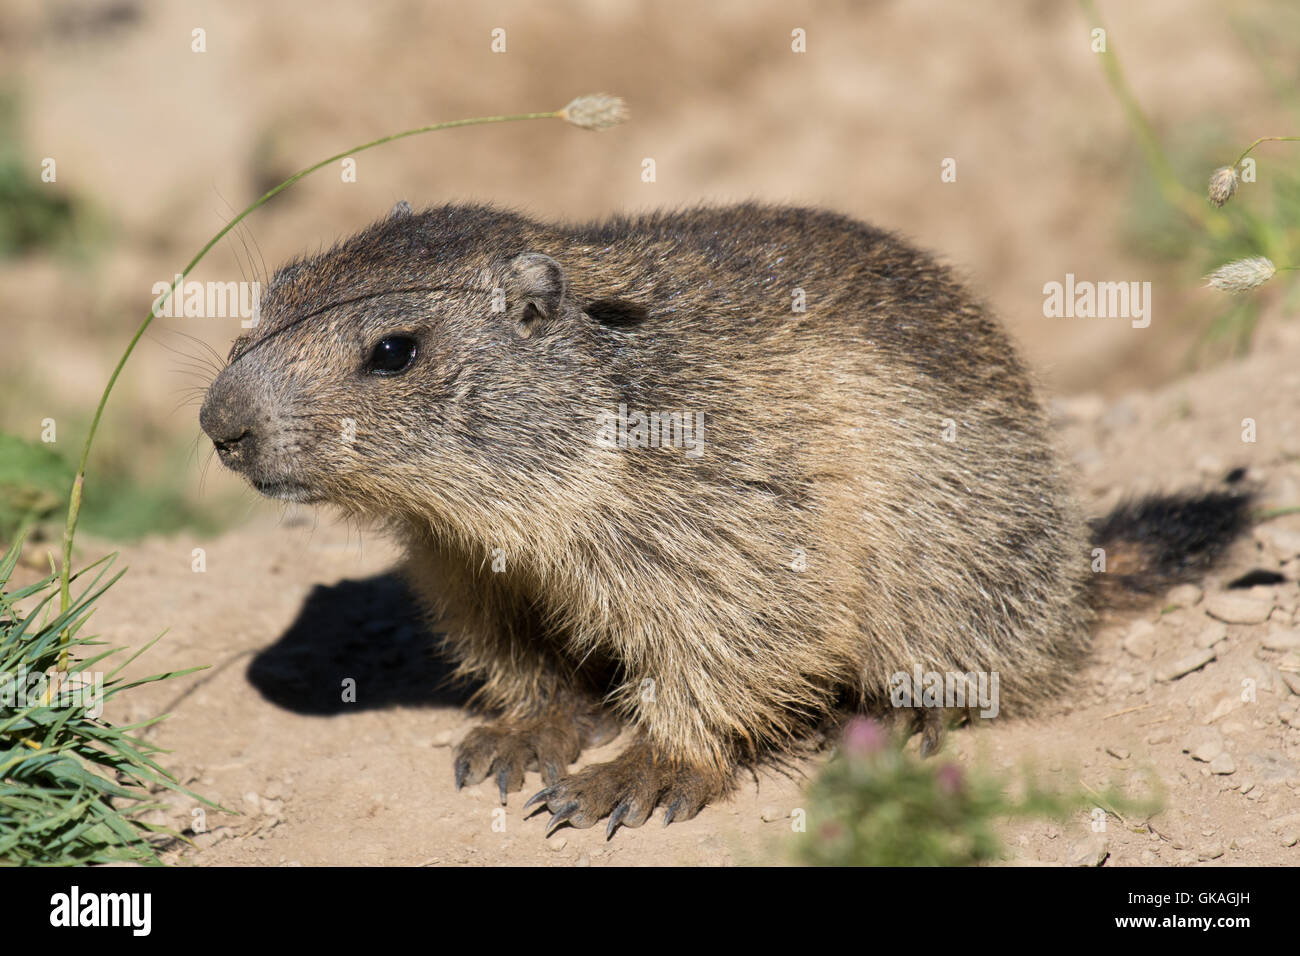 young Alpine Marmot (Marmota marmota) - Stock Image